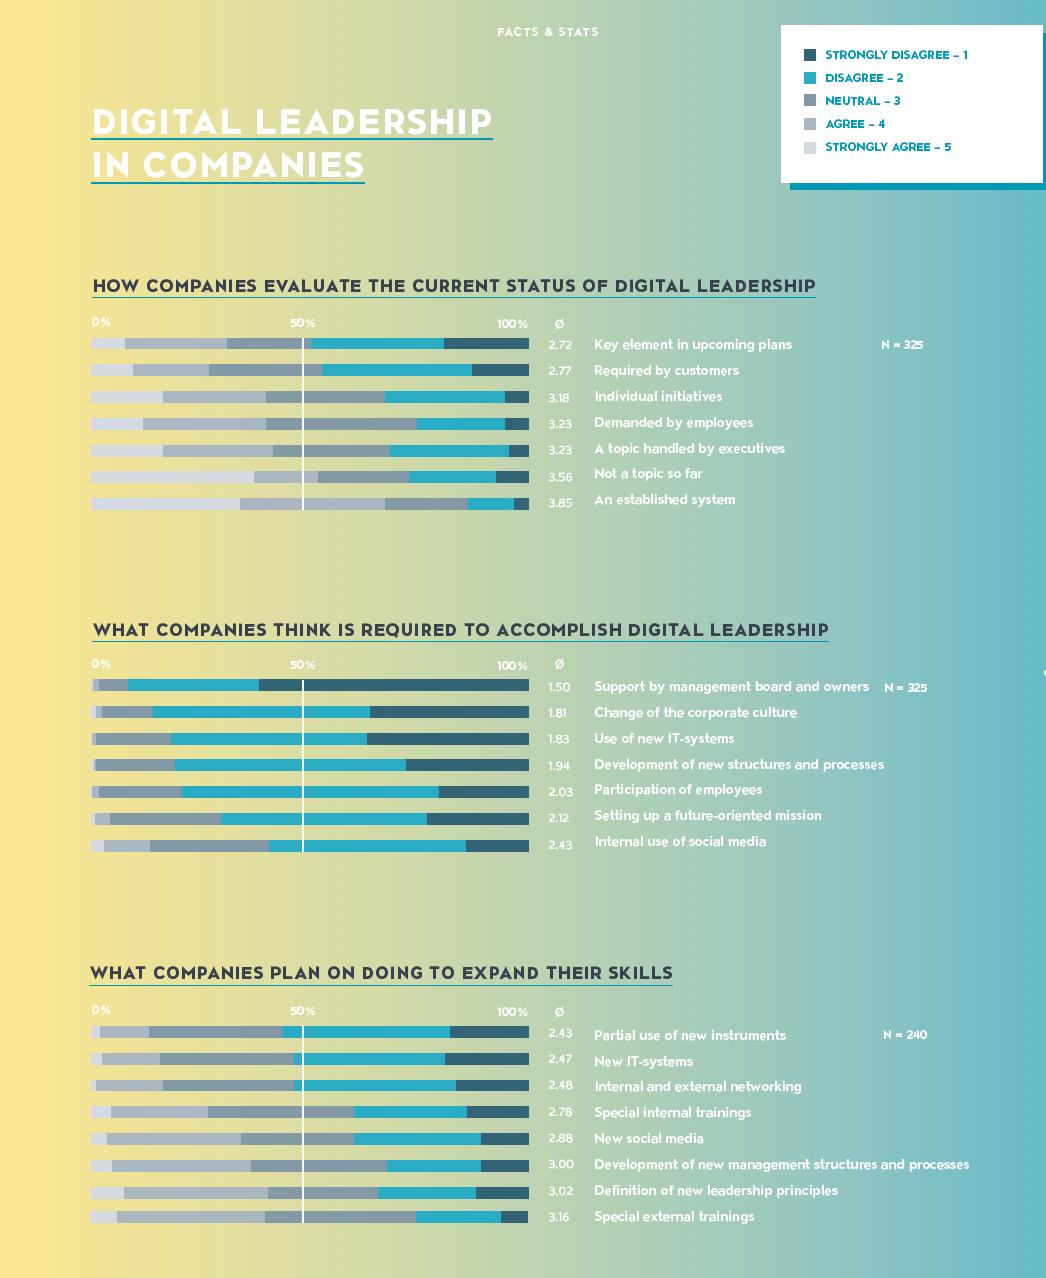 chart showing digital leadership in companies